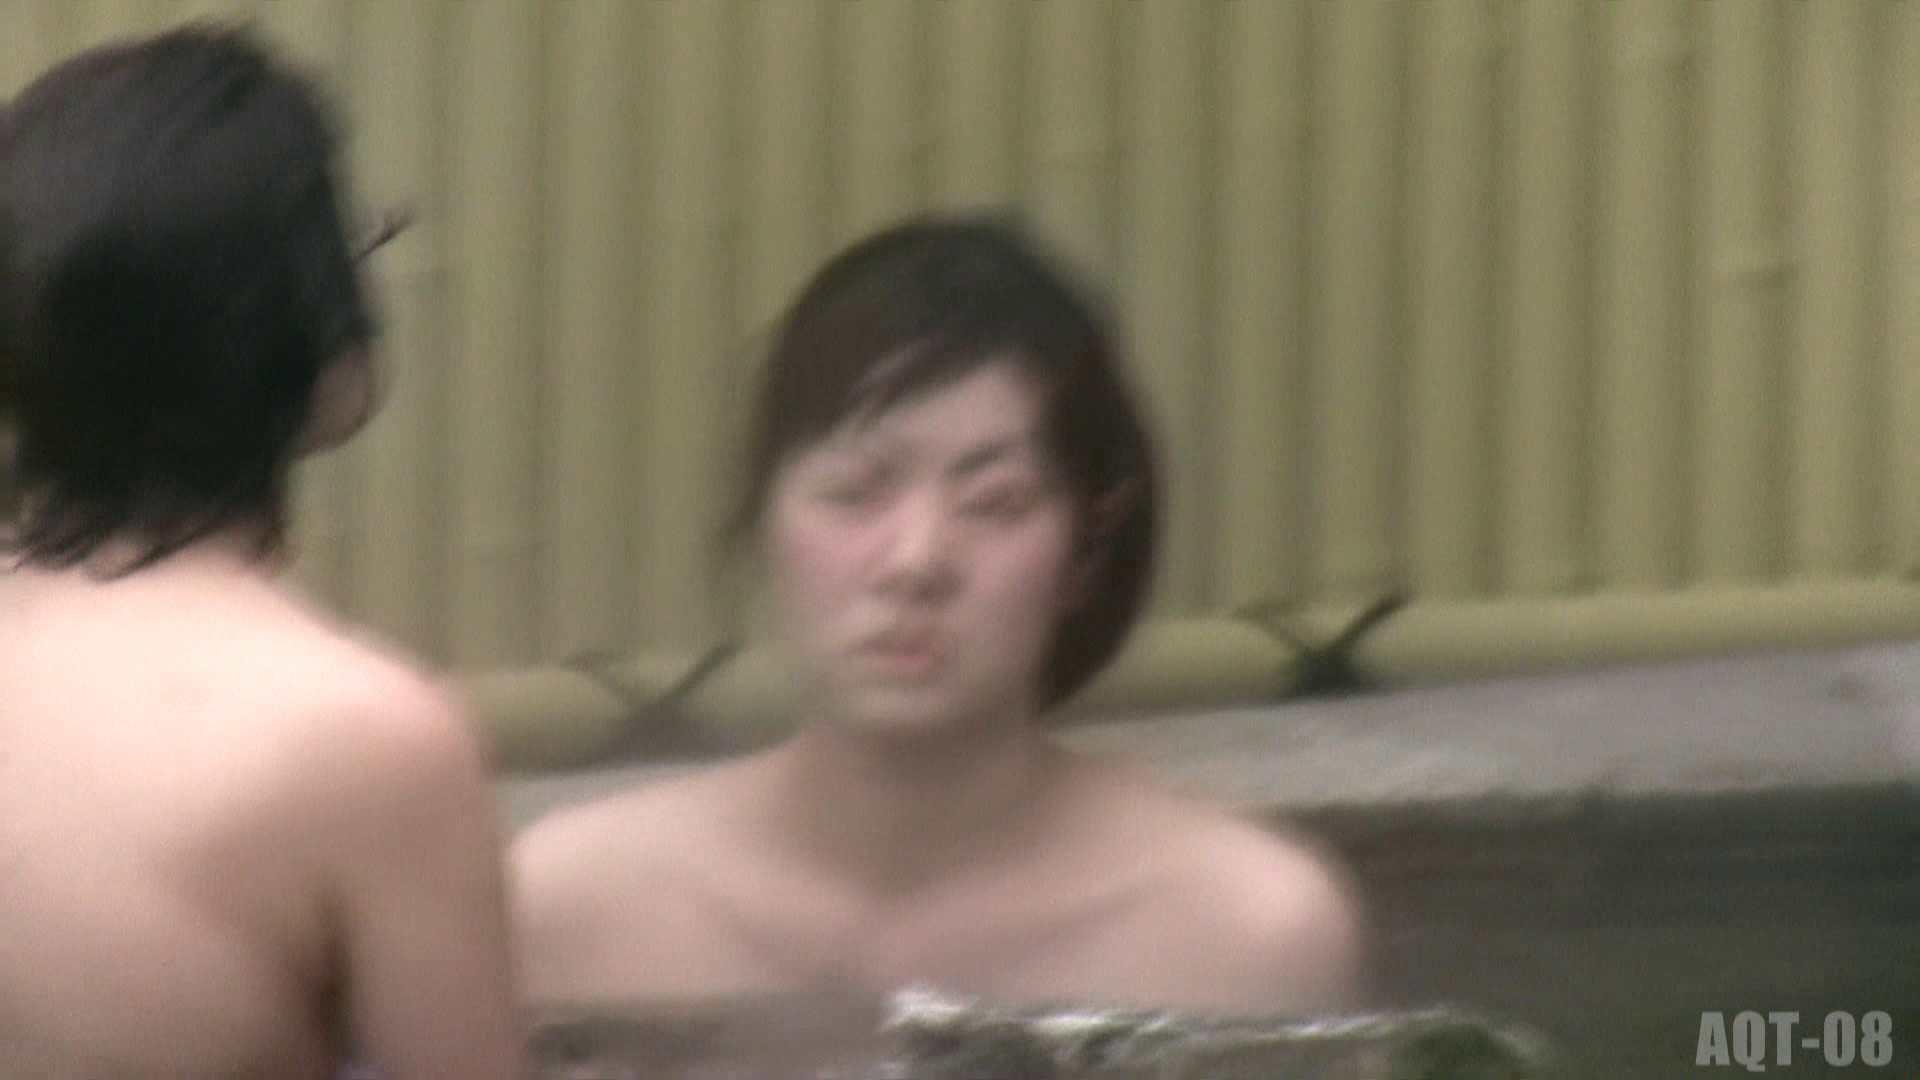 Aquaな露天風呂Vol.774 HなOL AV無料動画キャプチャ 83pic 2